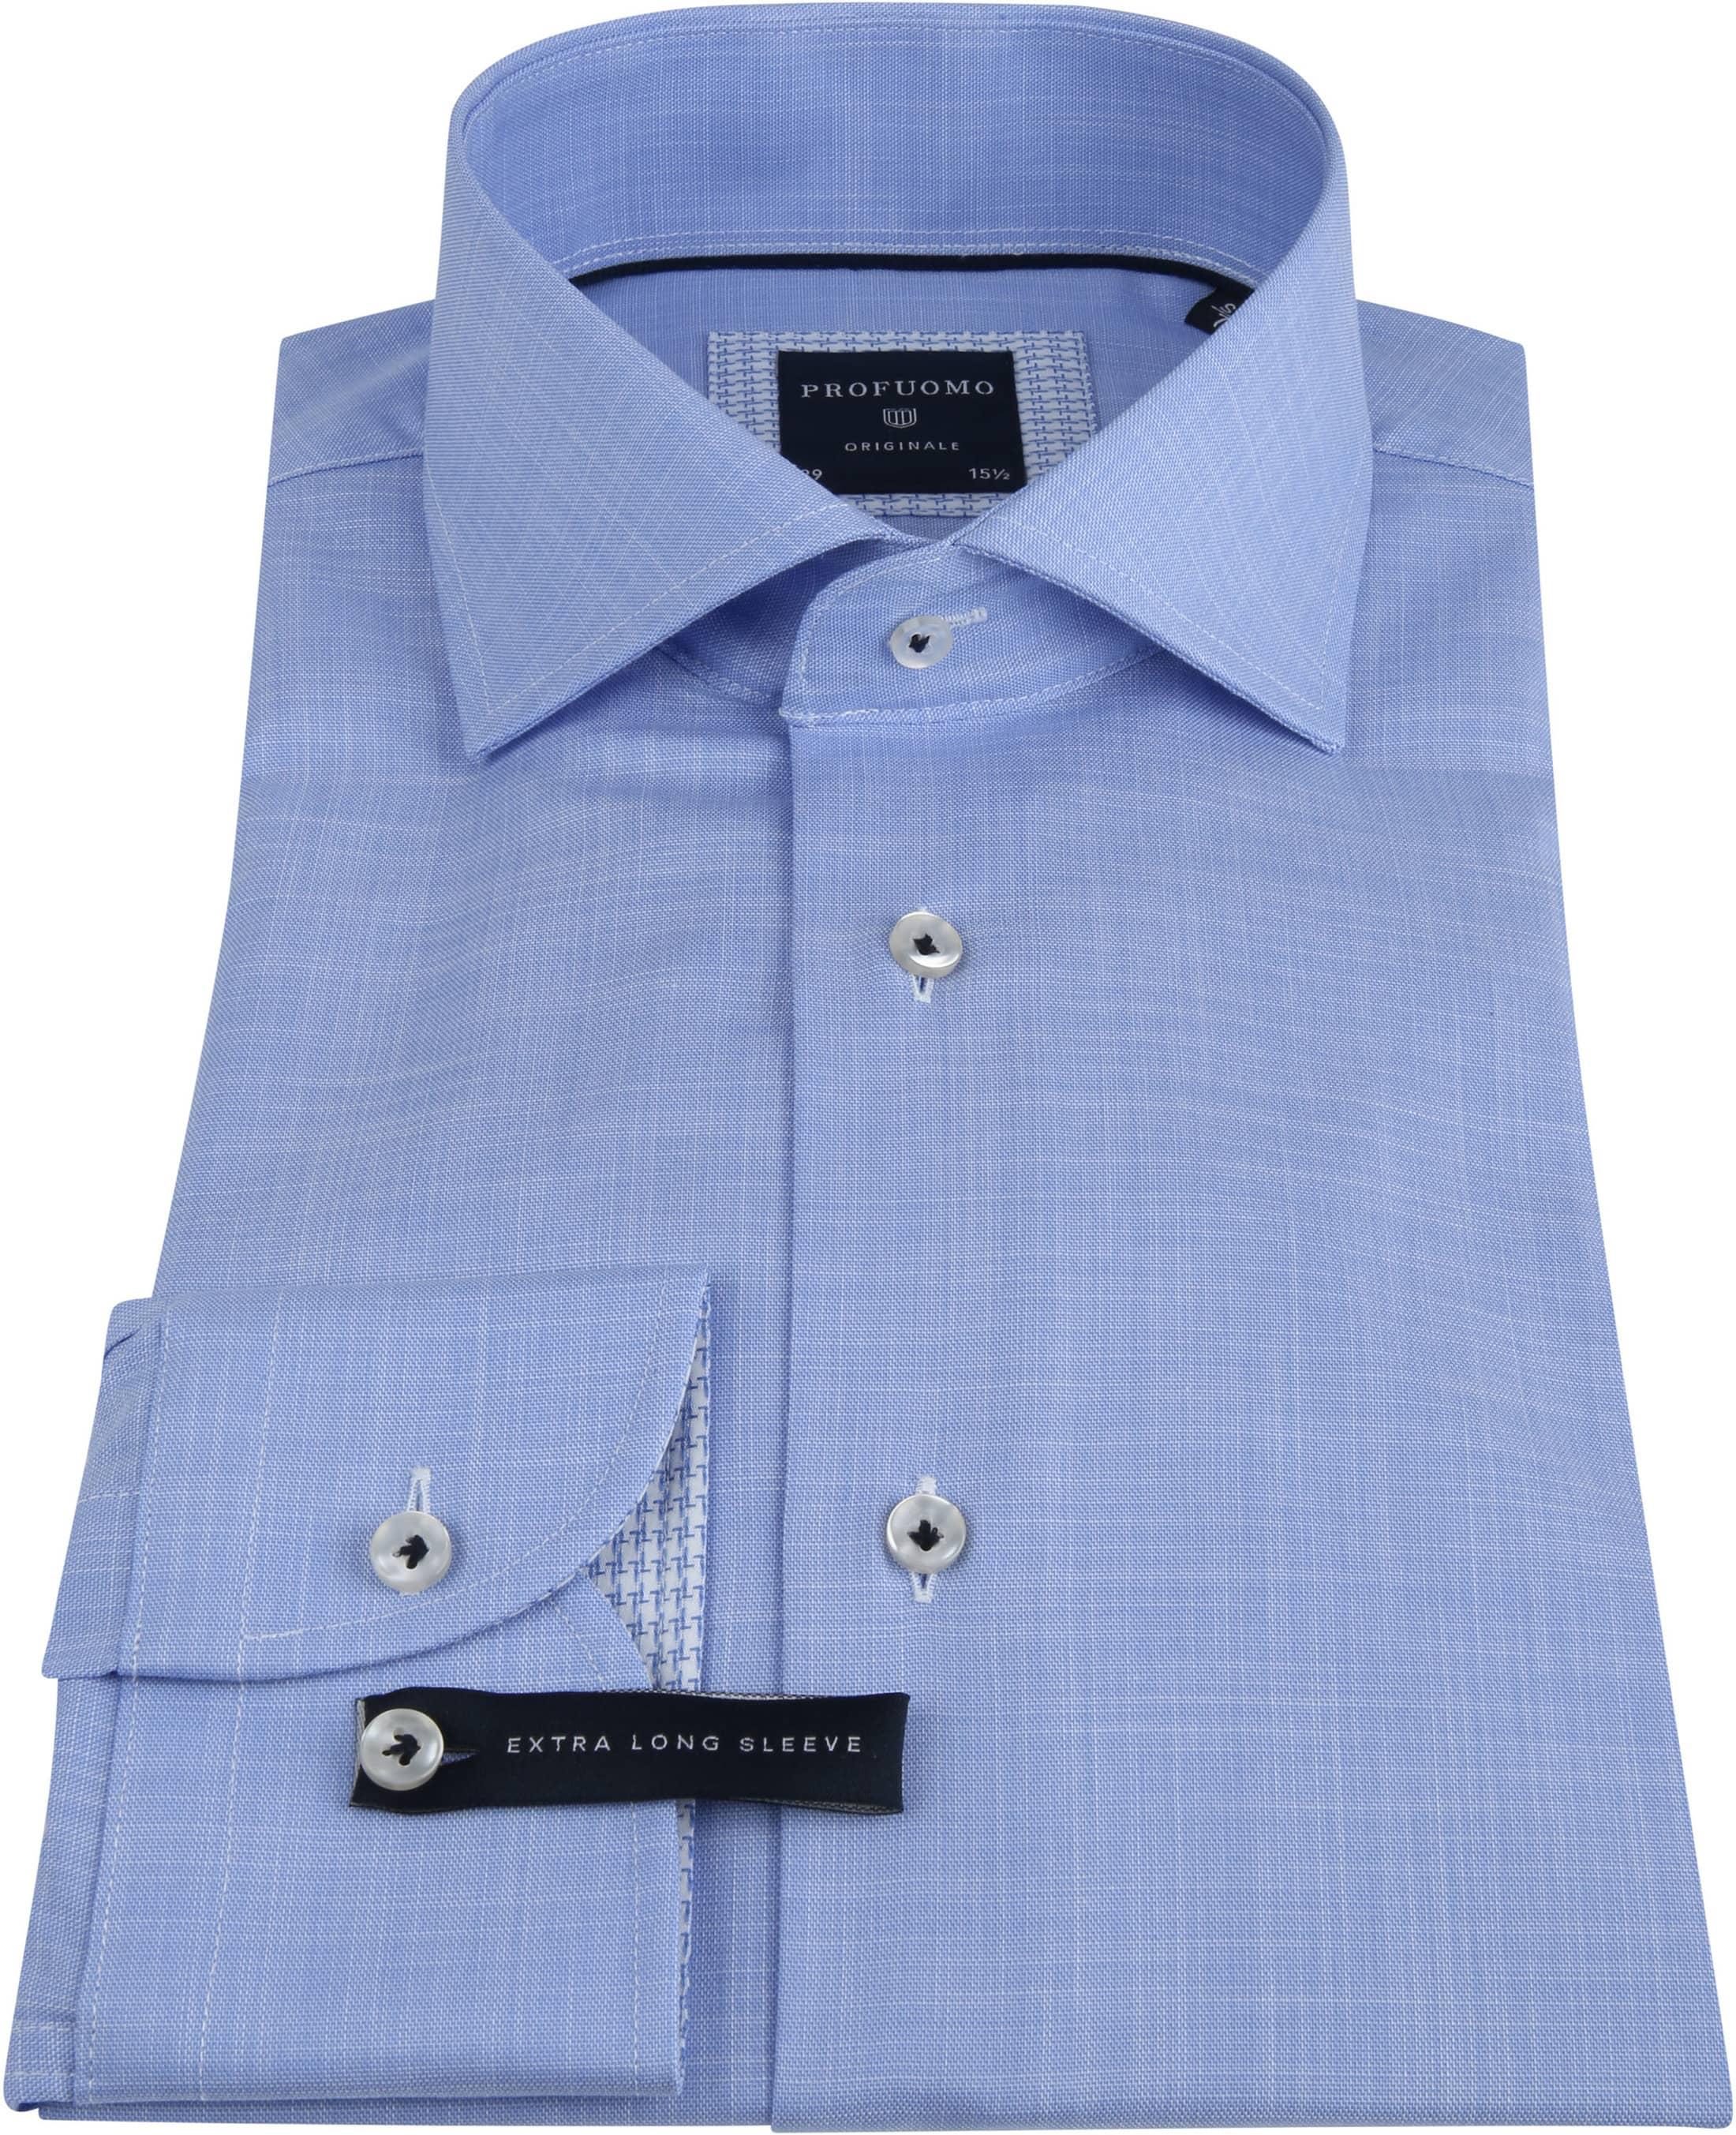 Profuomo Overhemd Melange Blauw SL7 foto 2